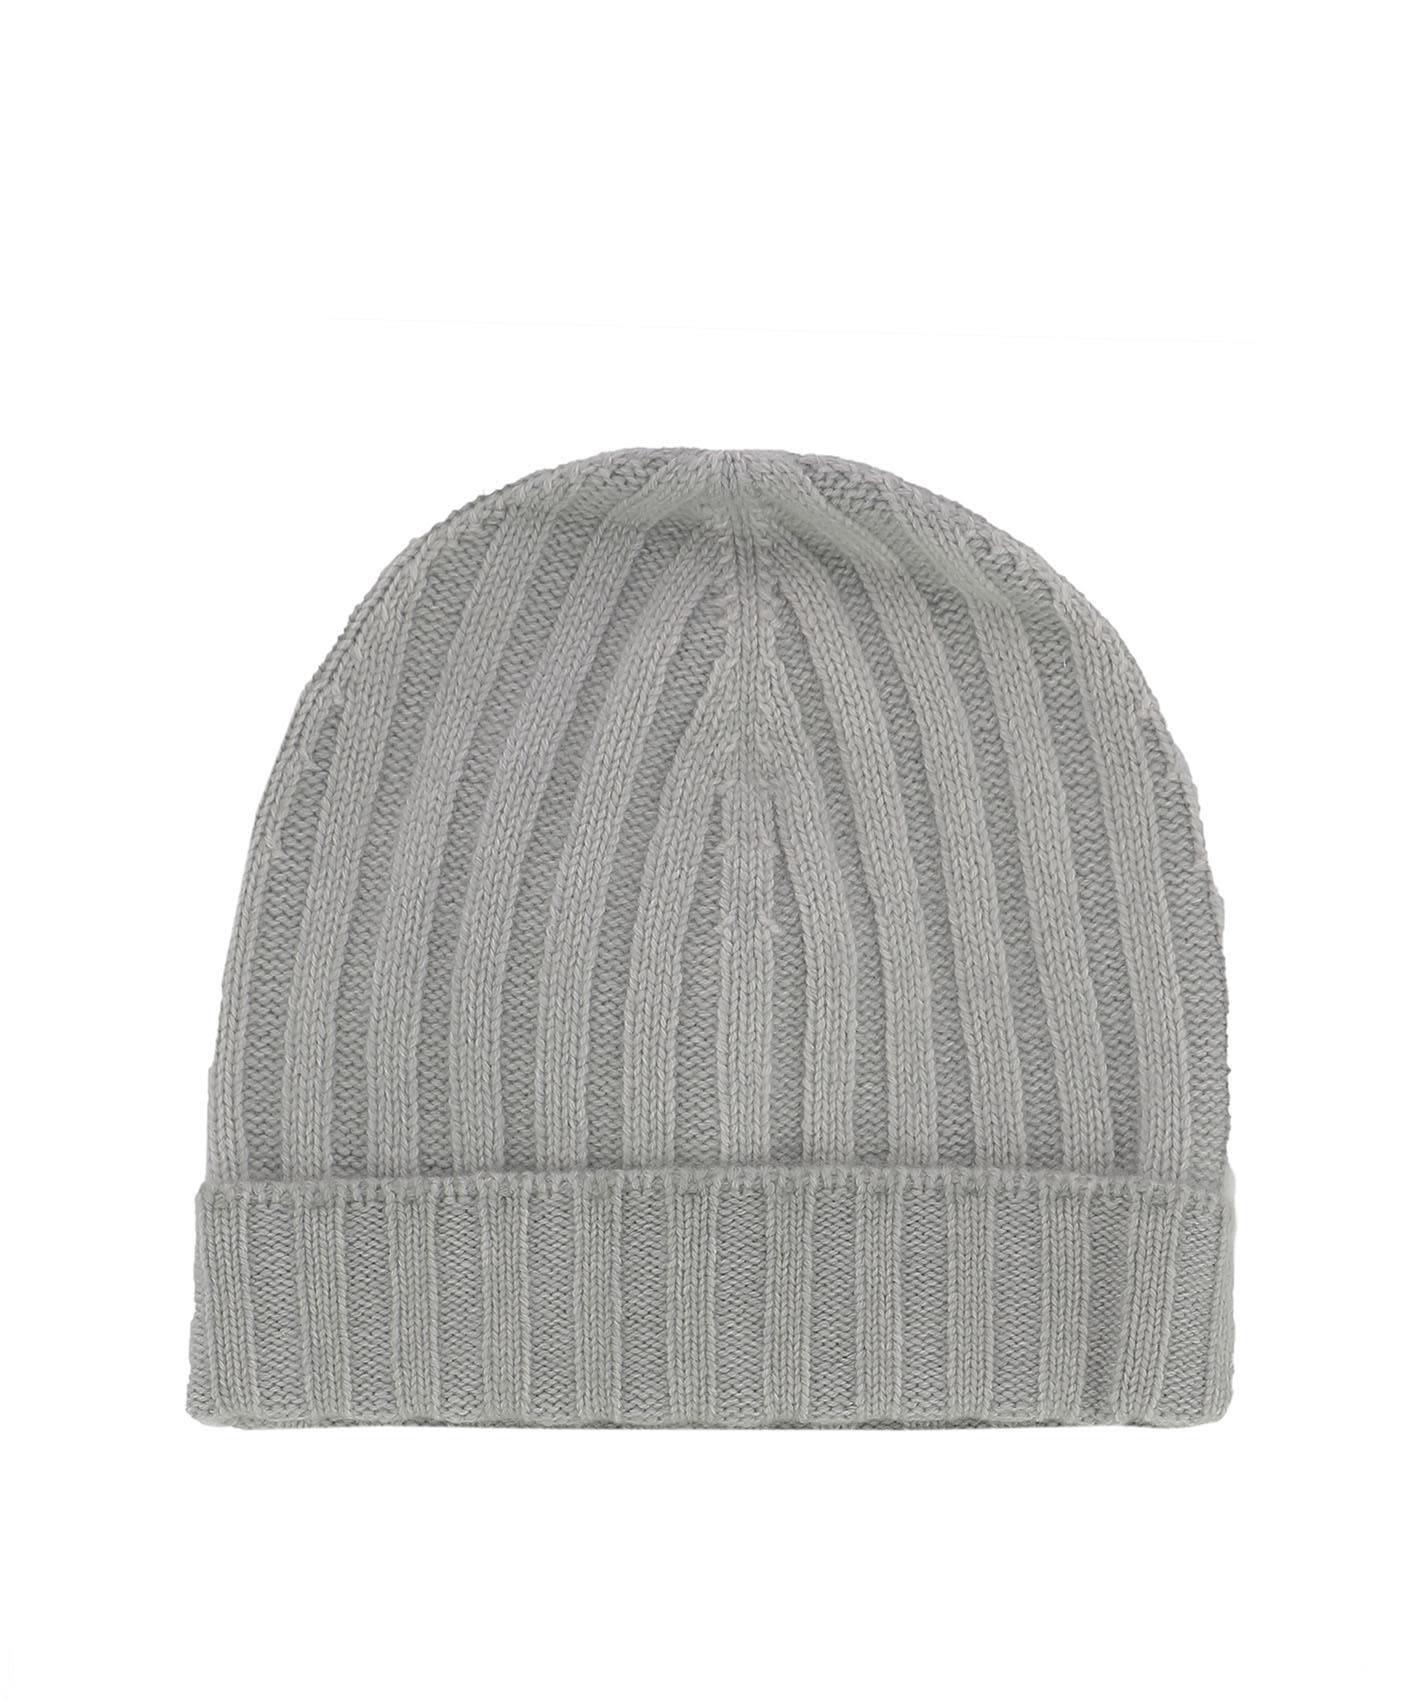 Gran Sasso Grey Cachemire Hat